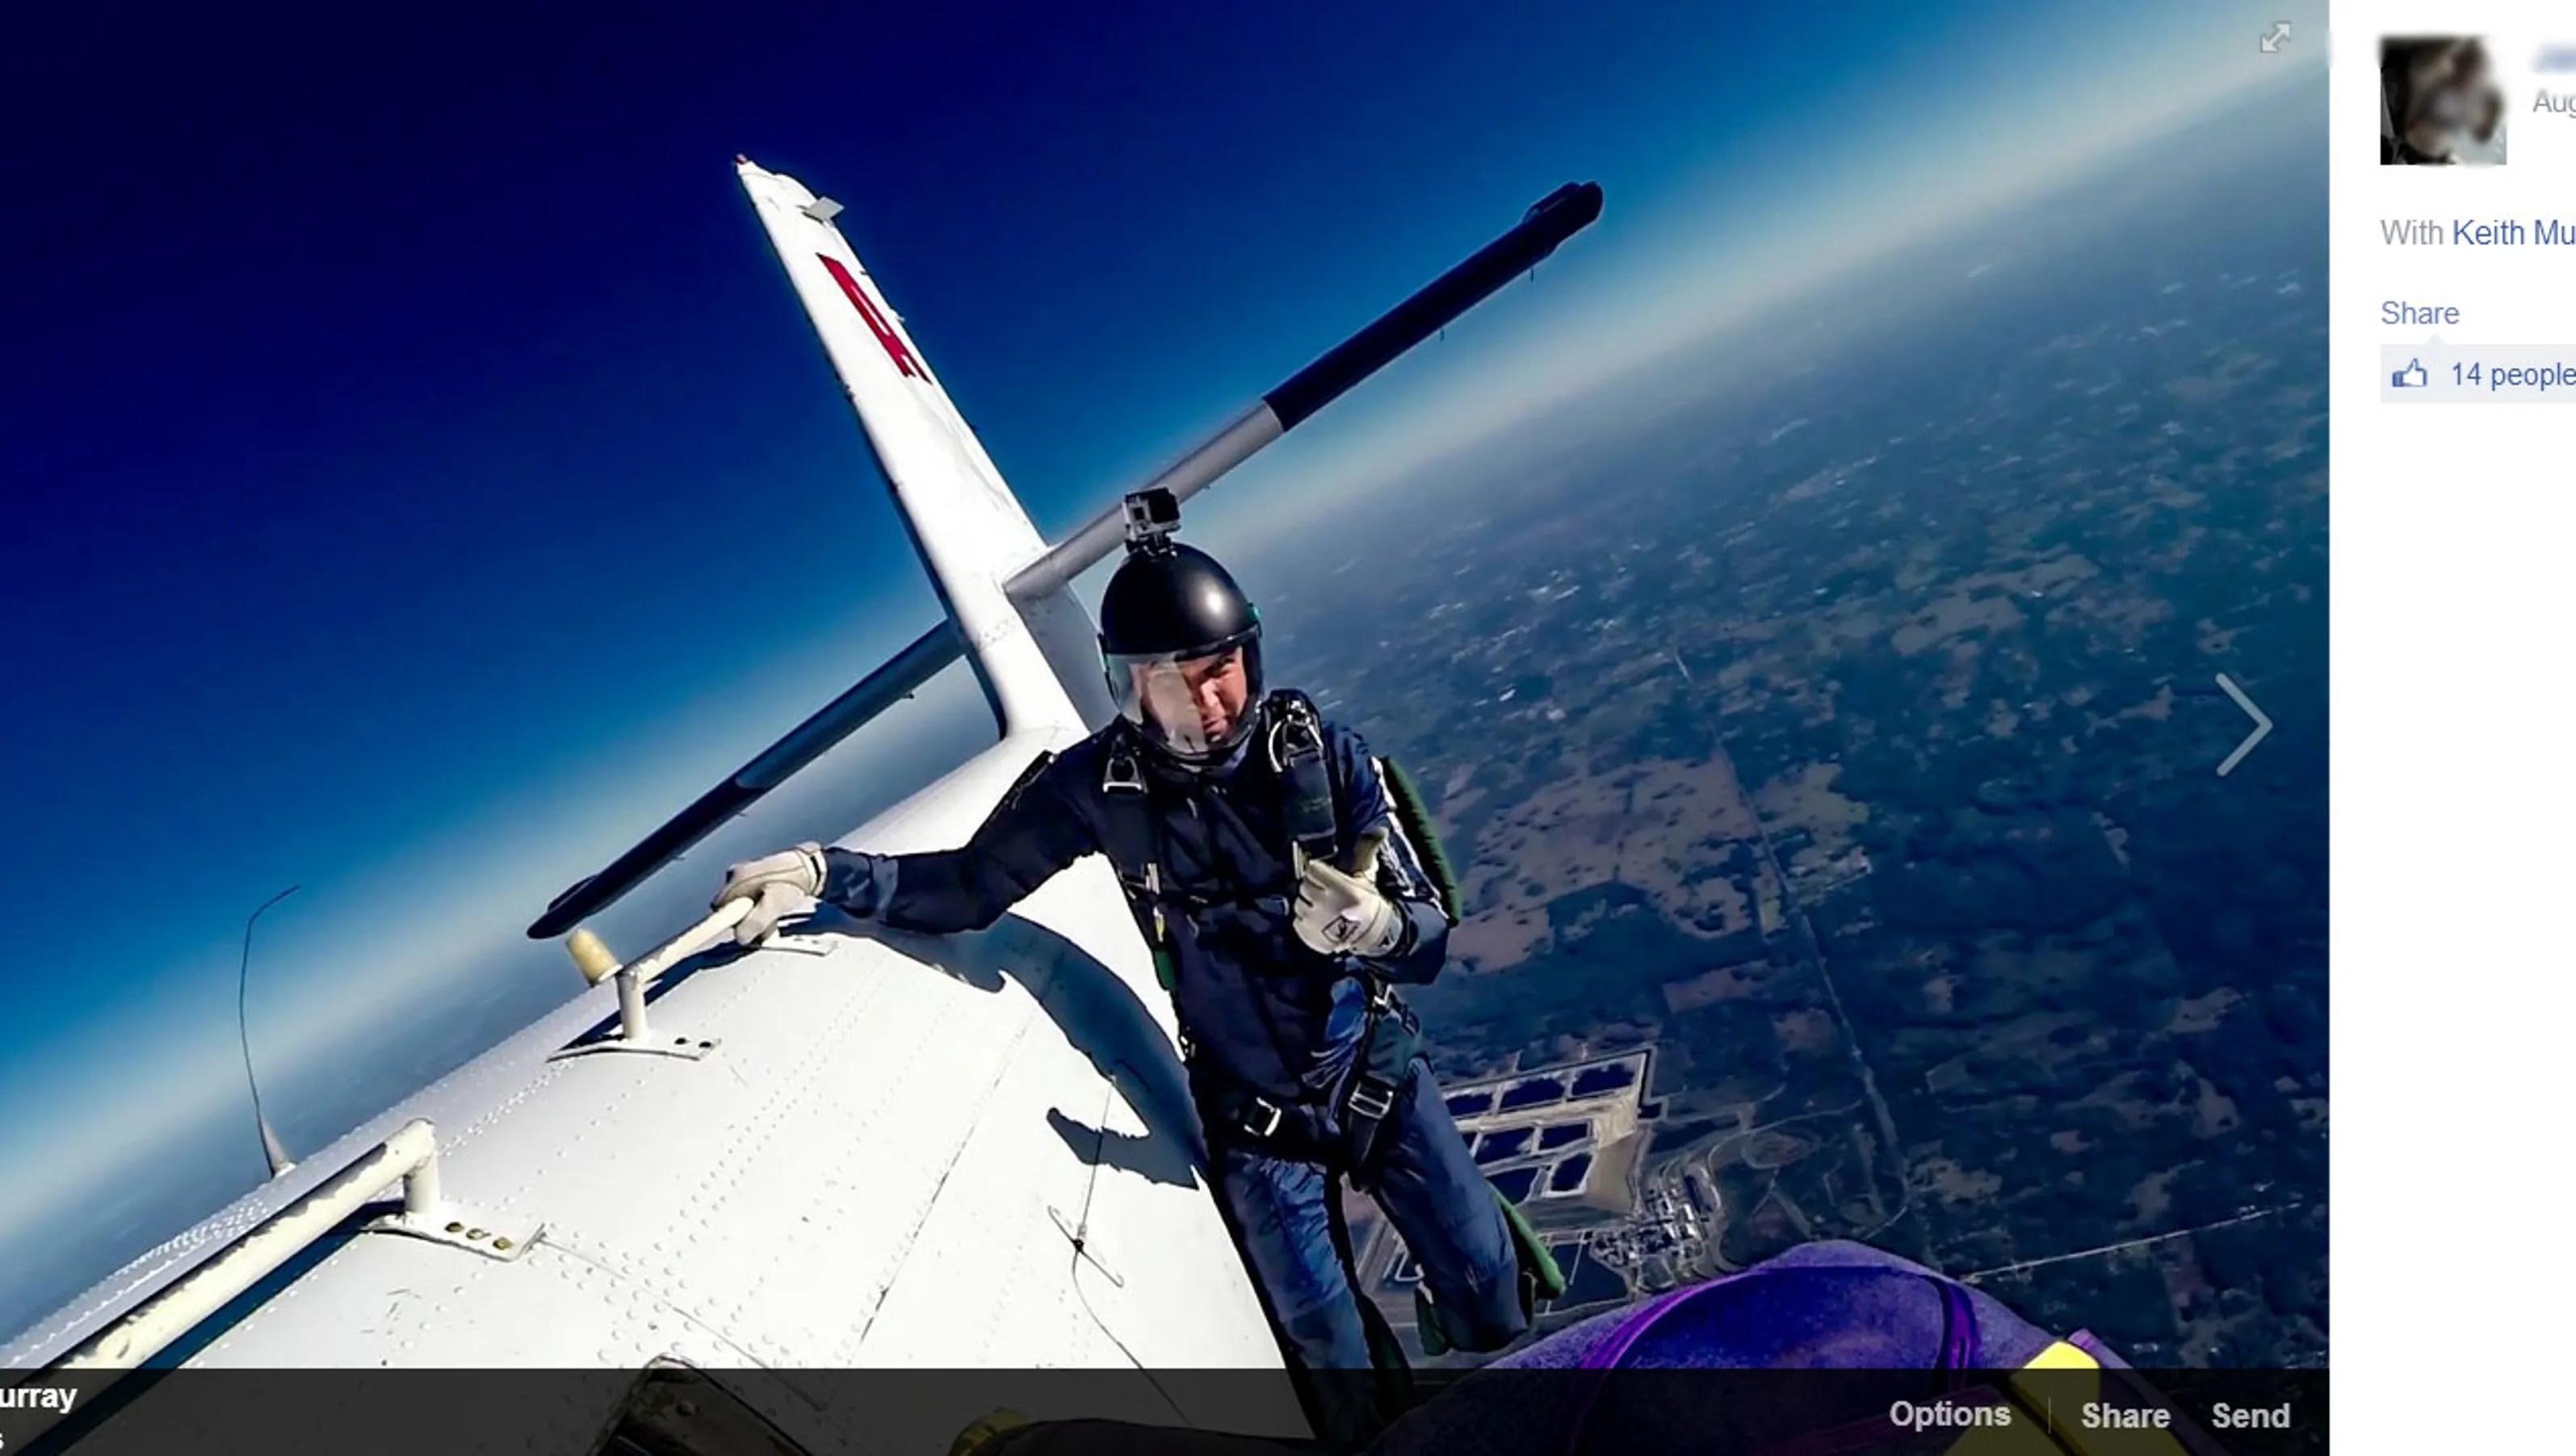 Skydiving Skydiving Zephyrhills Accident